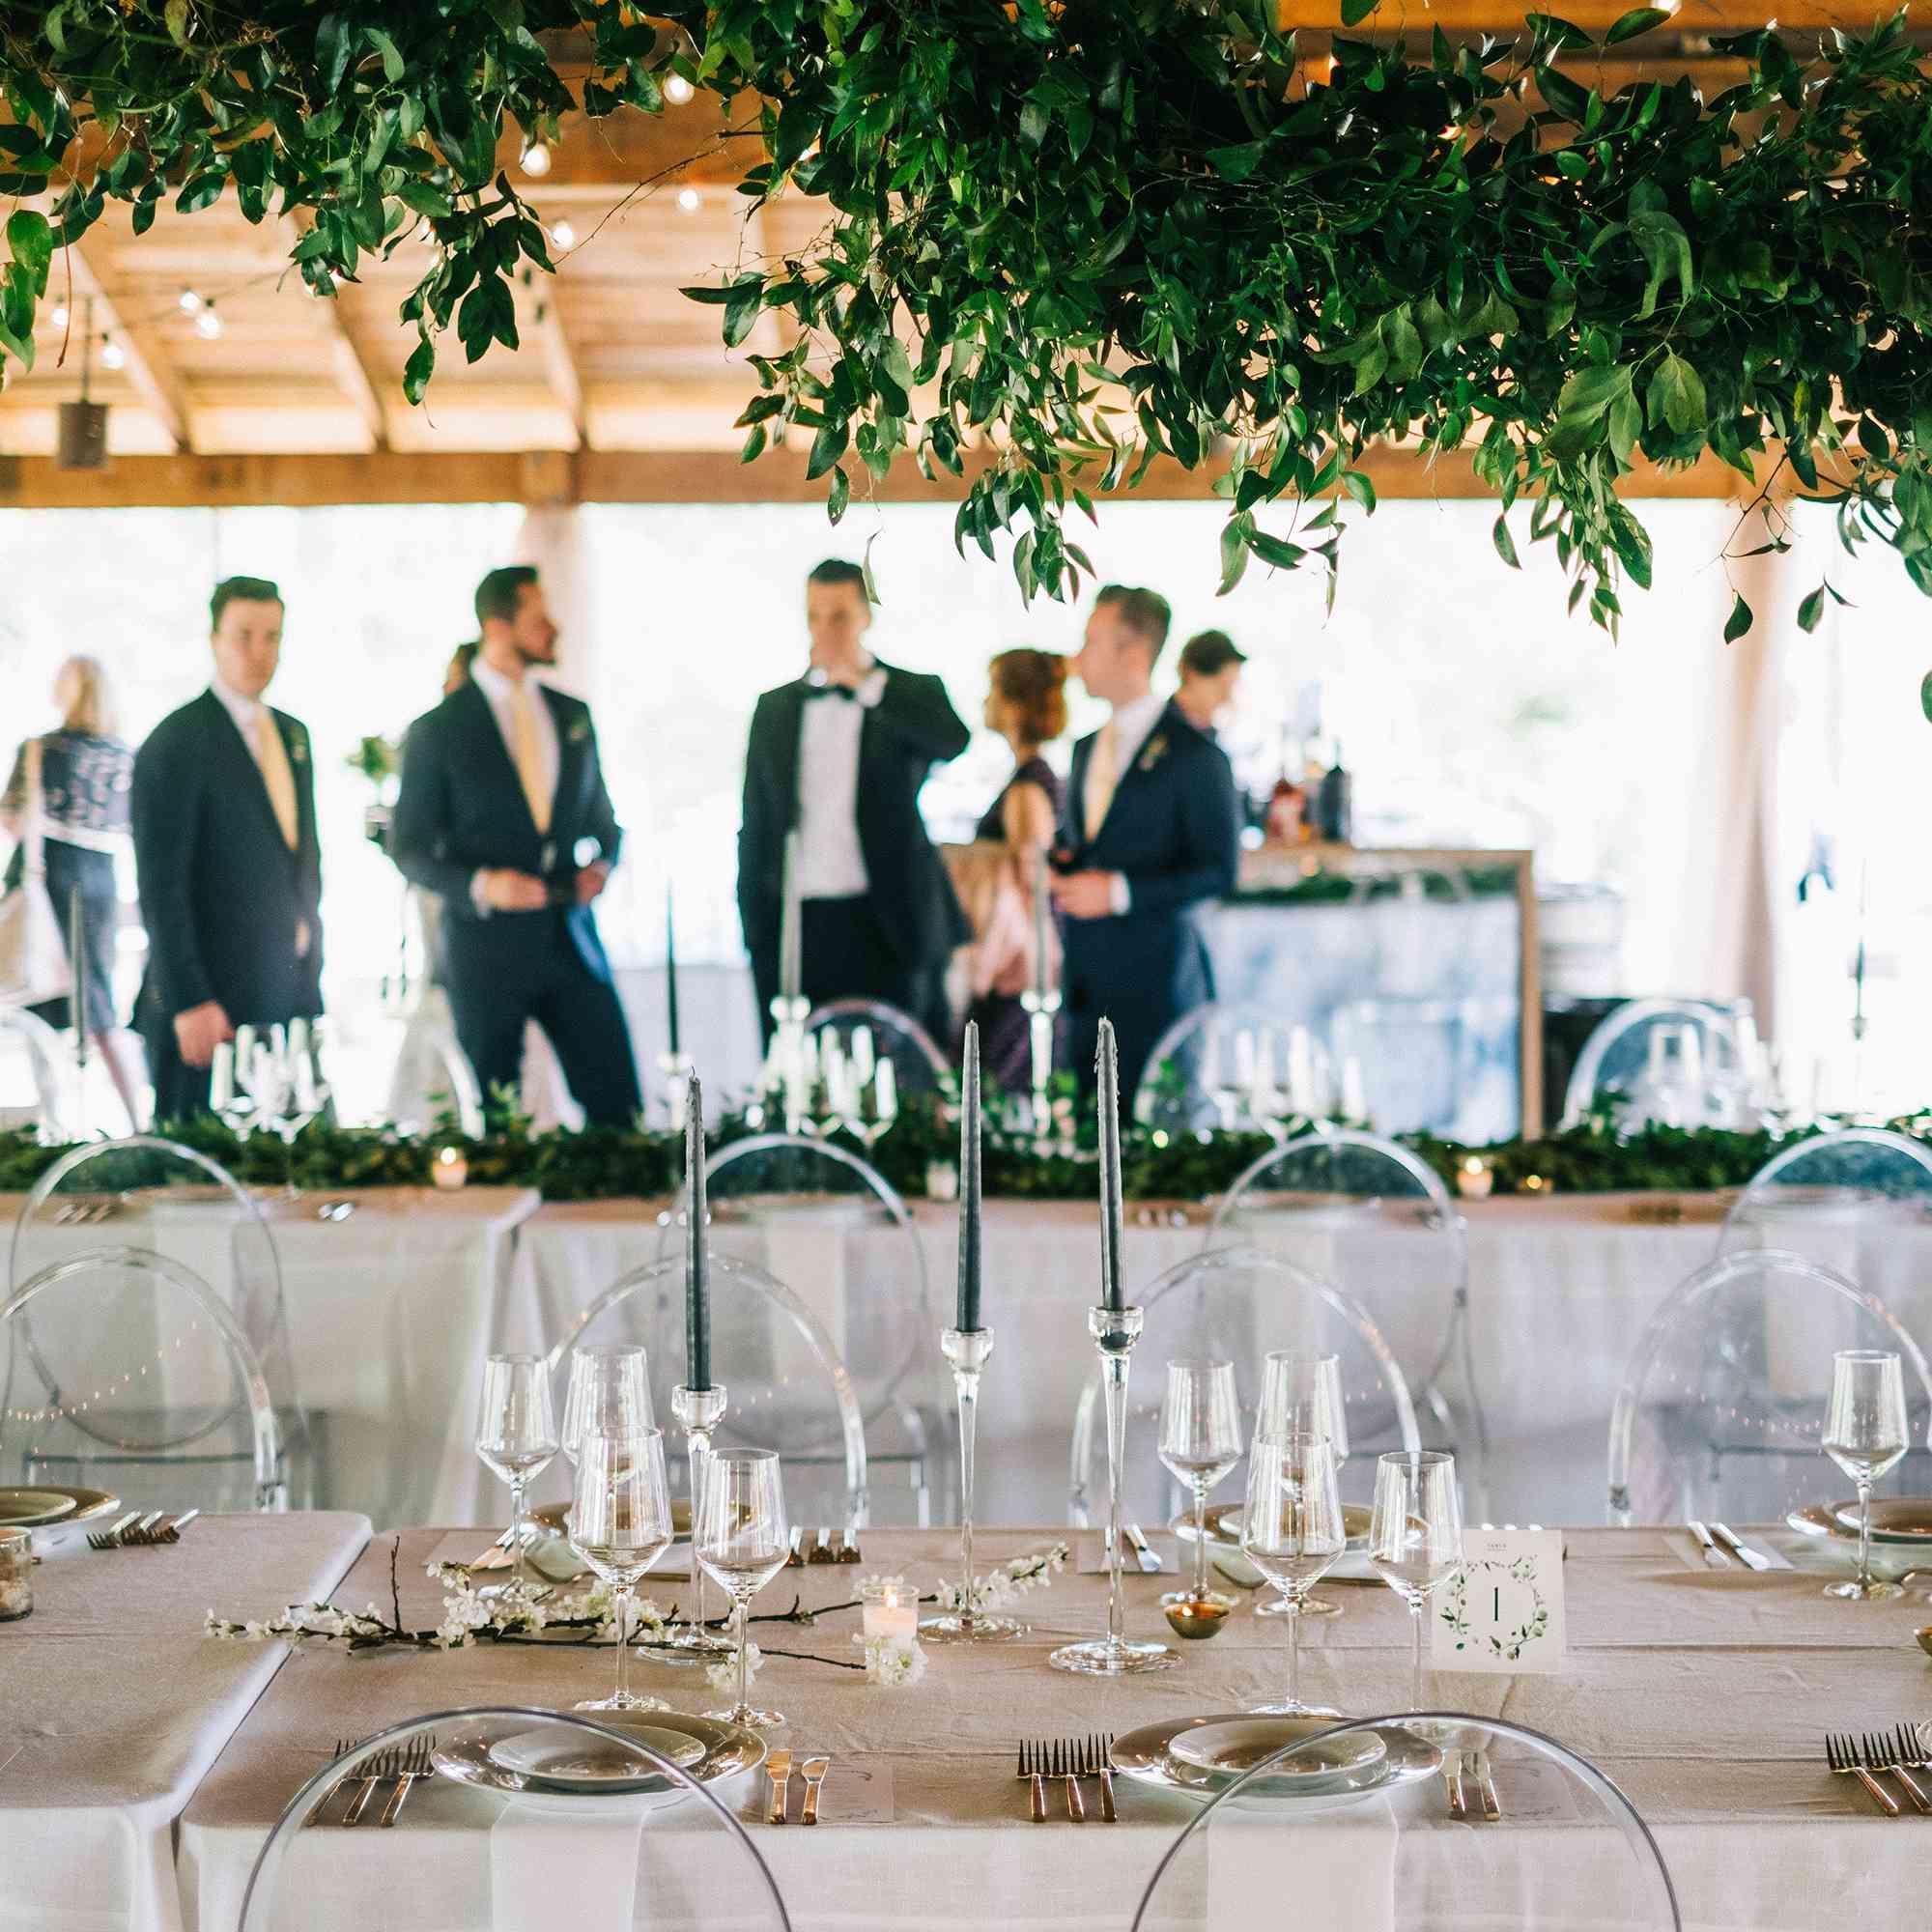 Greenery-inspired reception venue